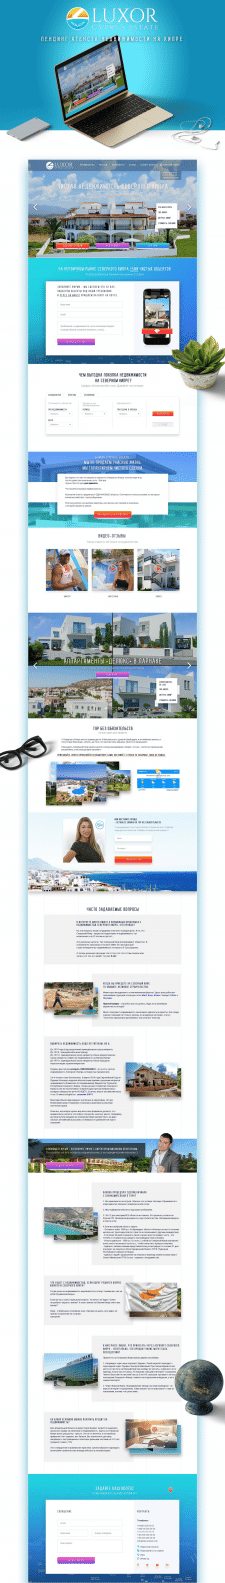 Luxor - LandingPage для недвижимости на Кипре